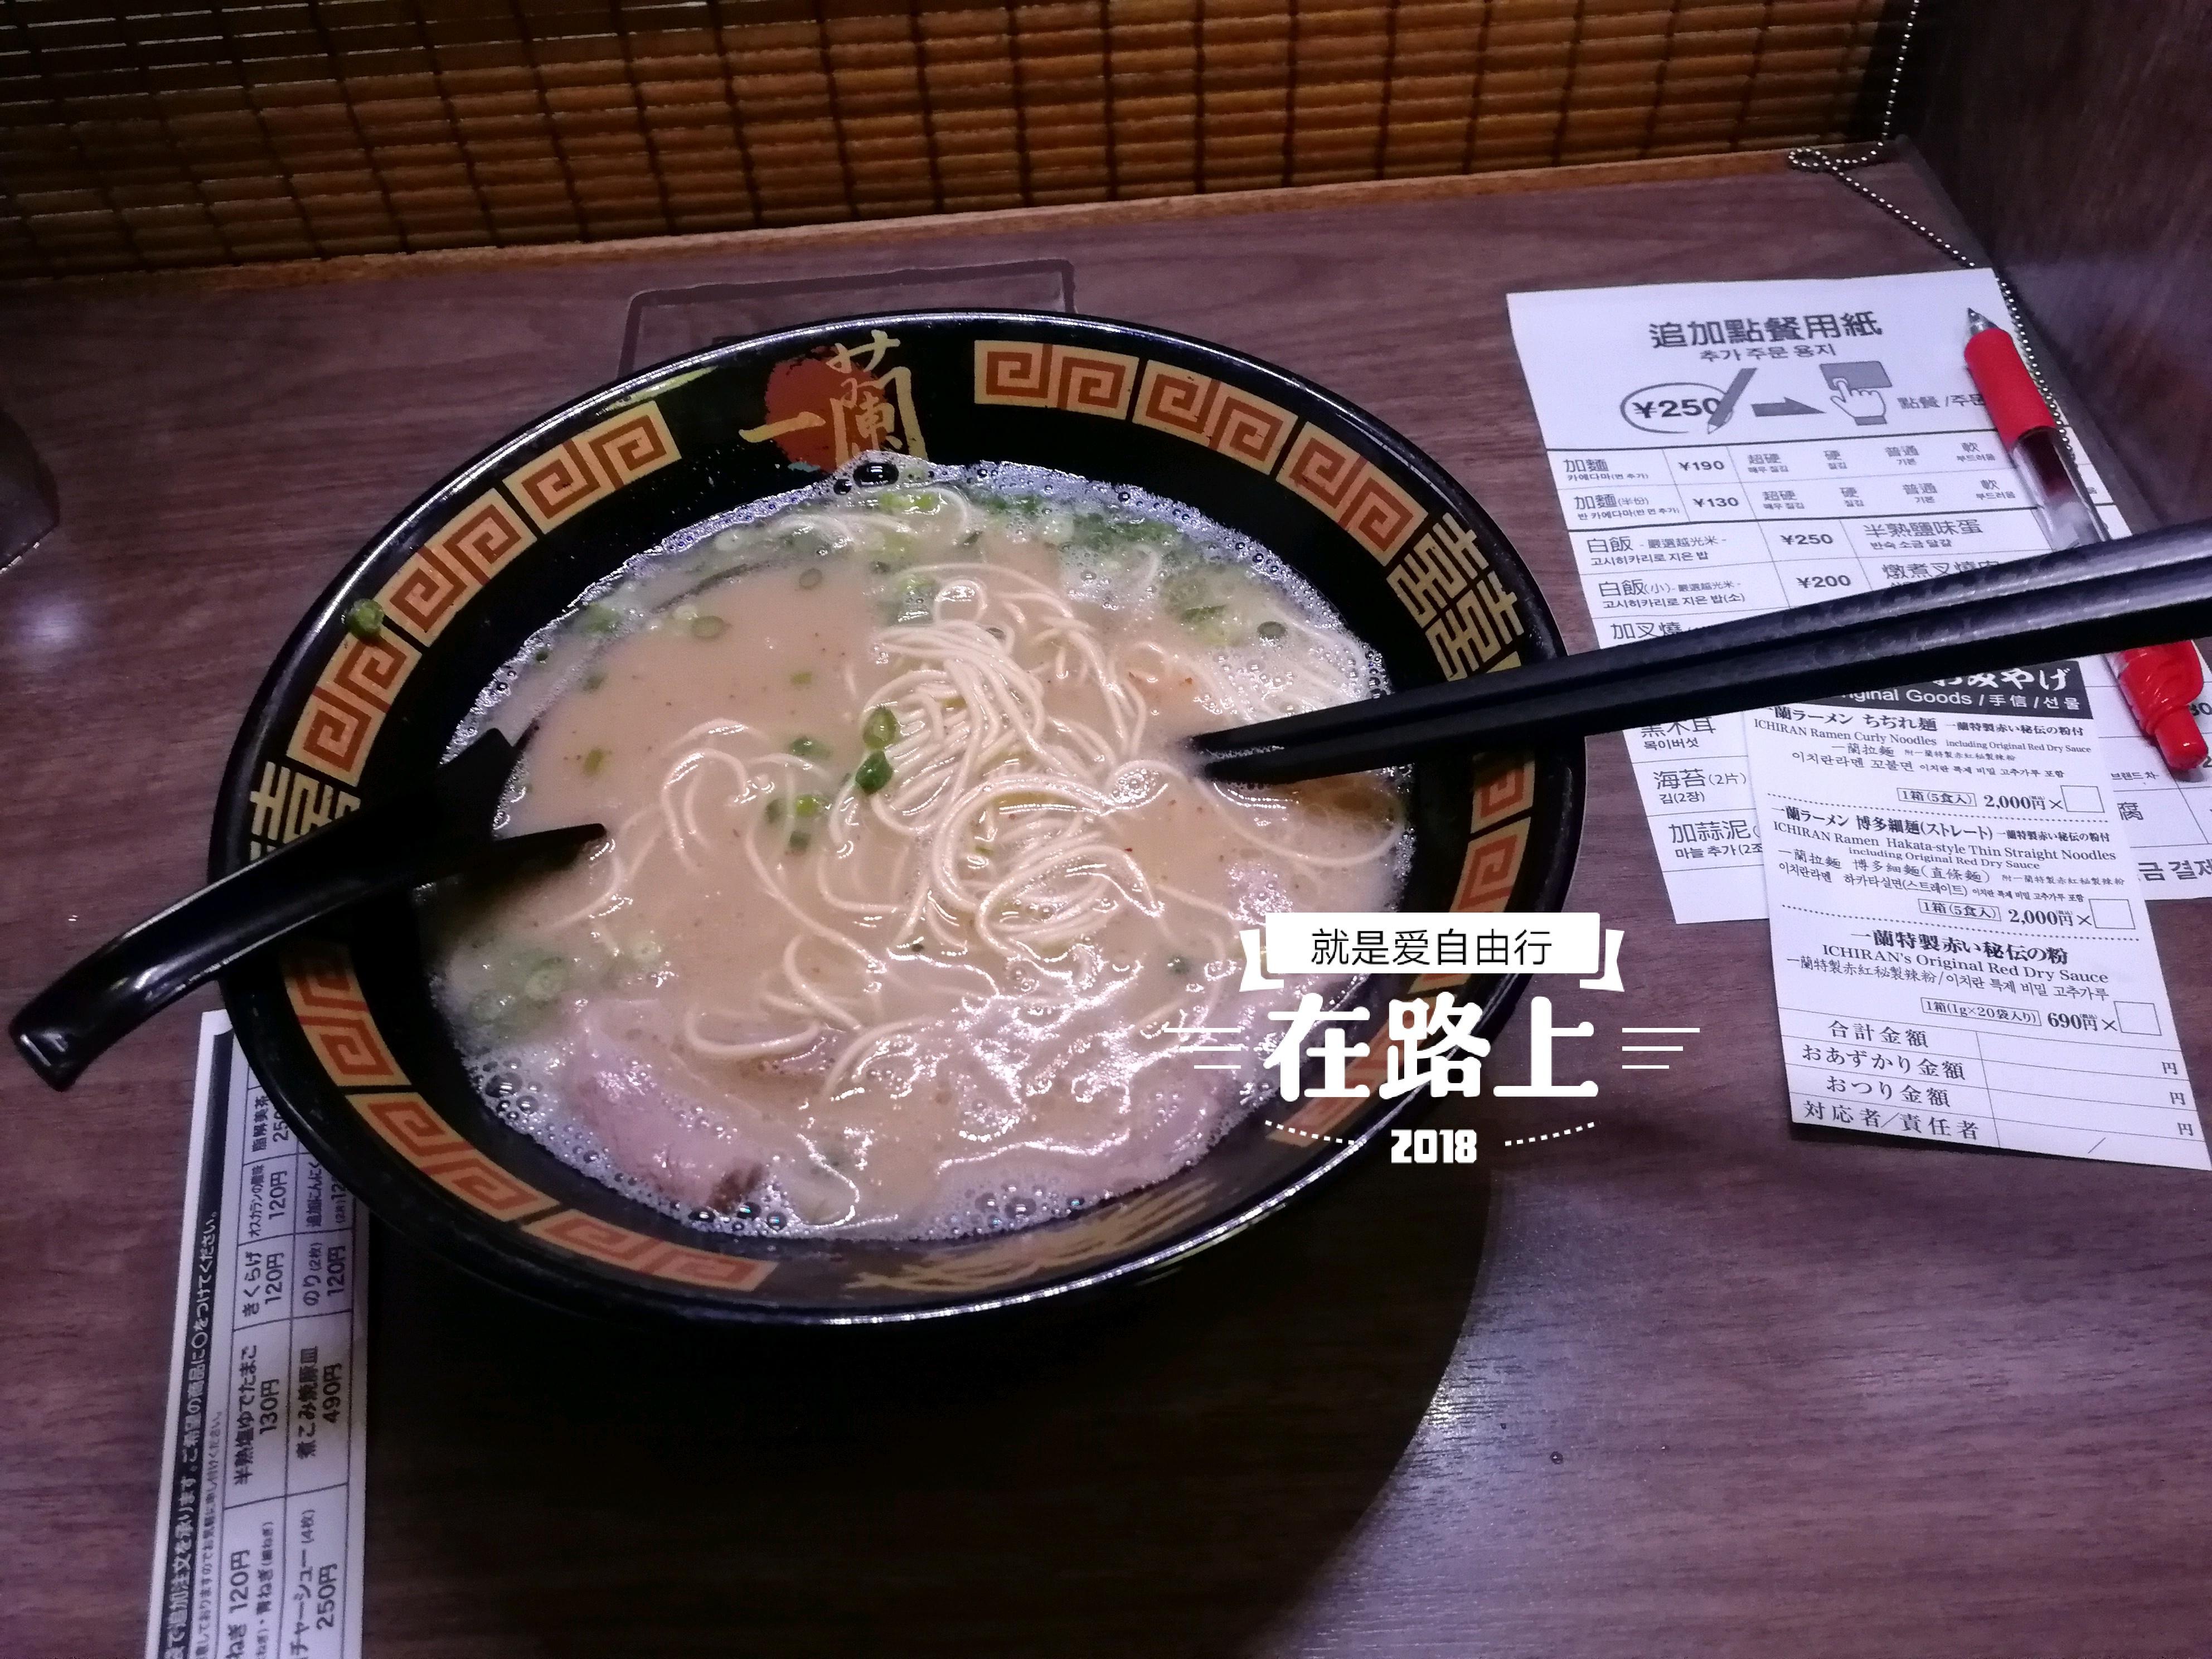 THE 皇家花园酒店 东京汐留 The Royal Park Hotel Tokyo Shiodome点评